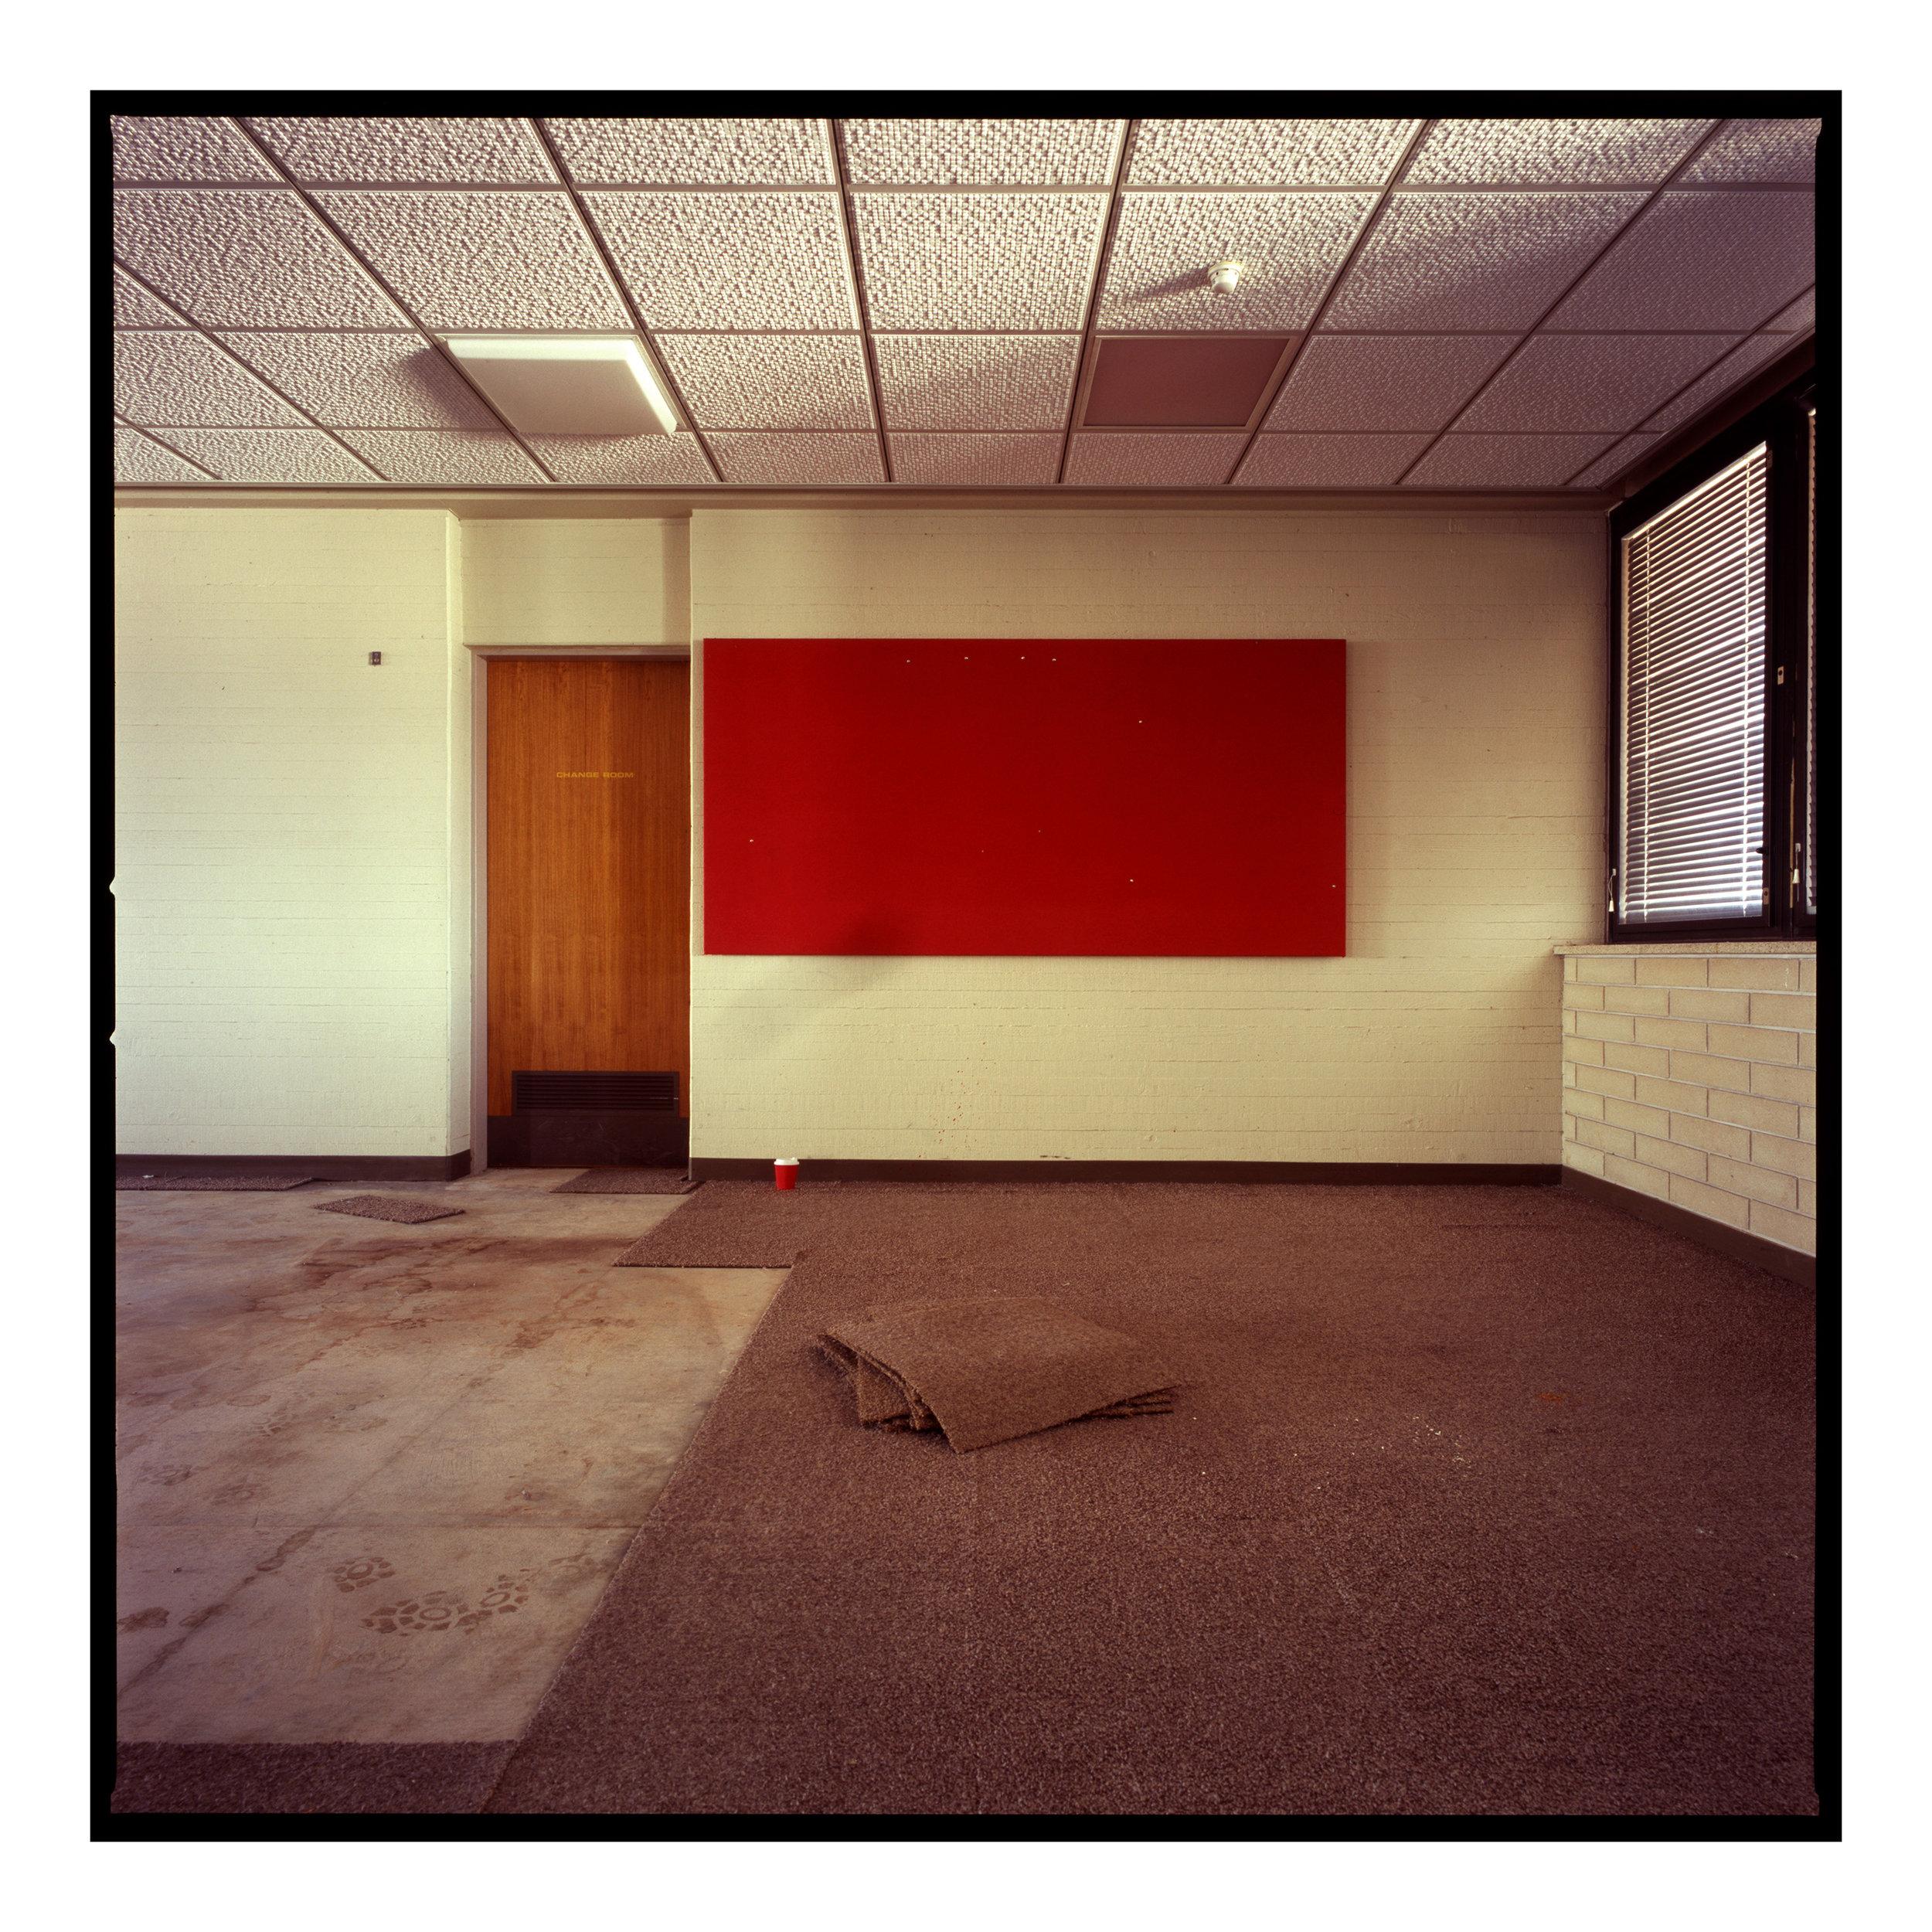 Tony Kearney's winning image, 5th Floor.